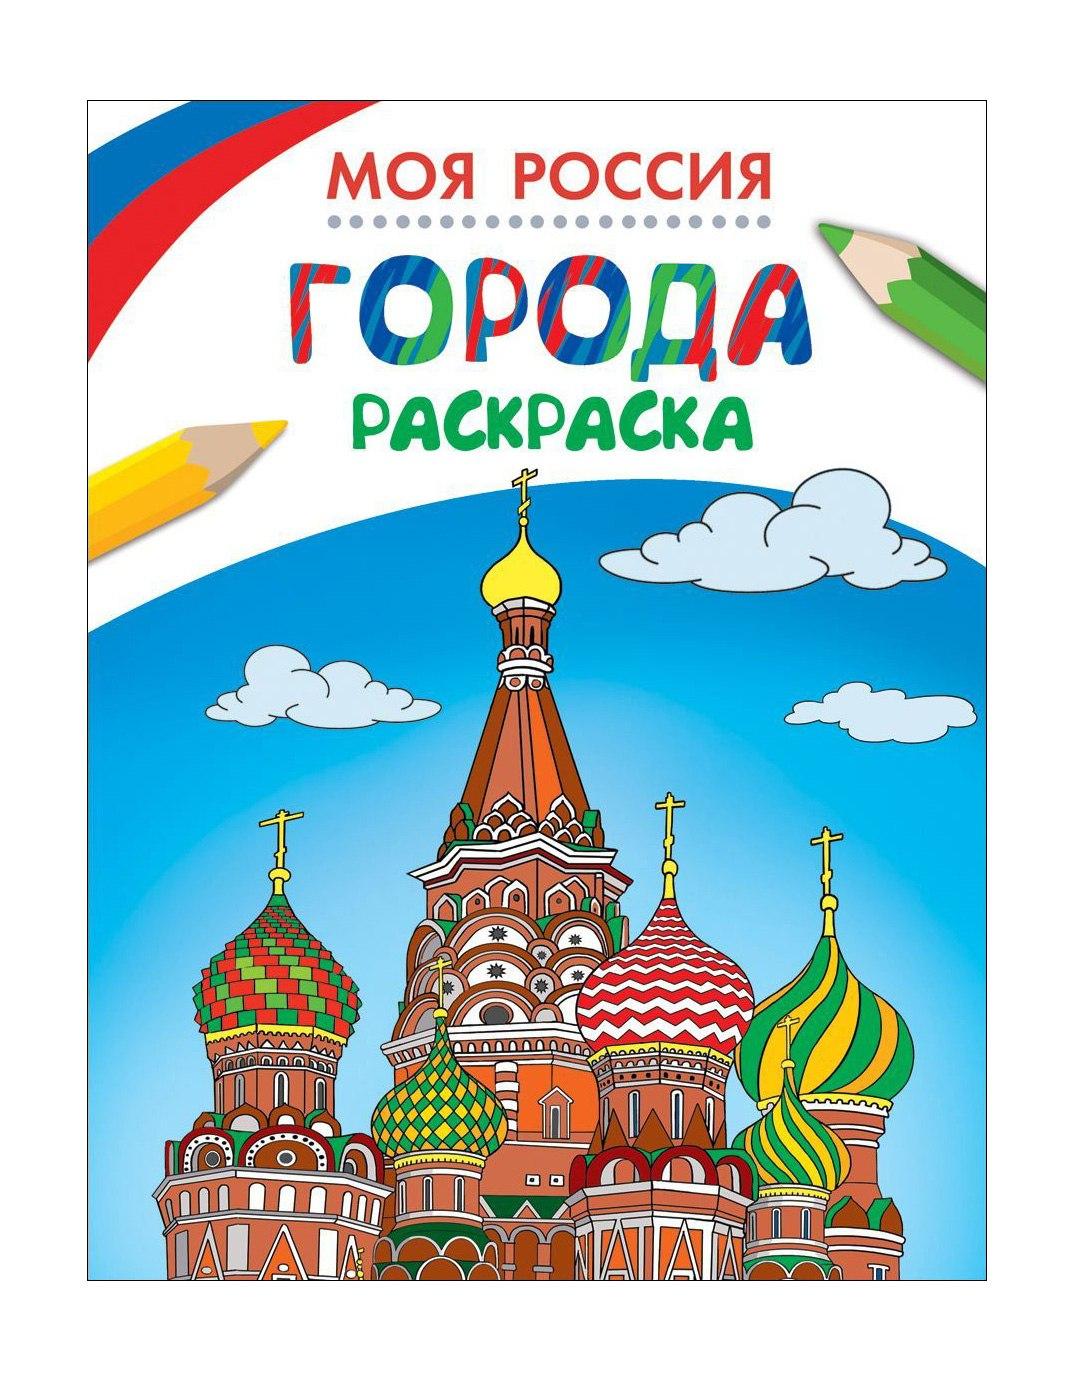 Москва родина картинки для детей